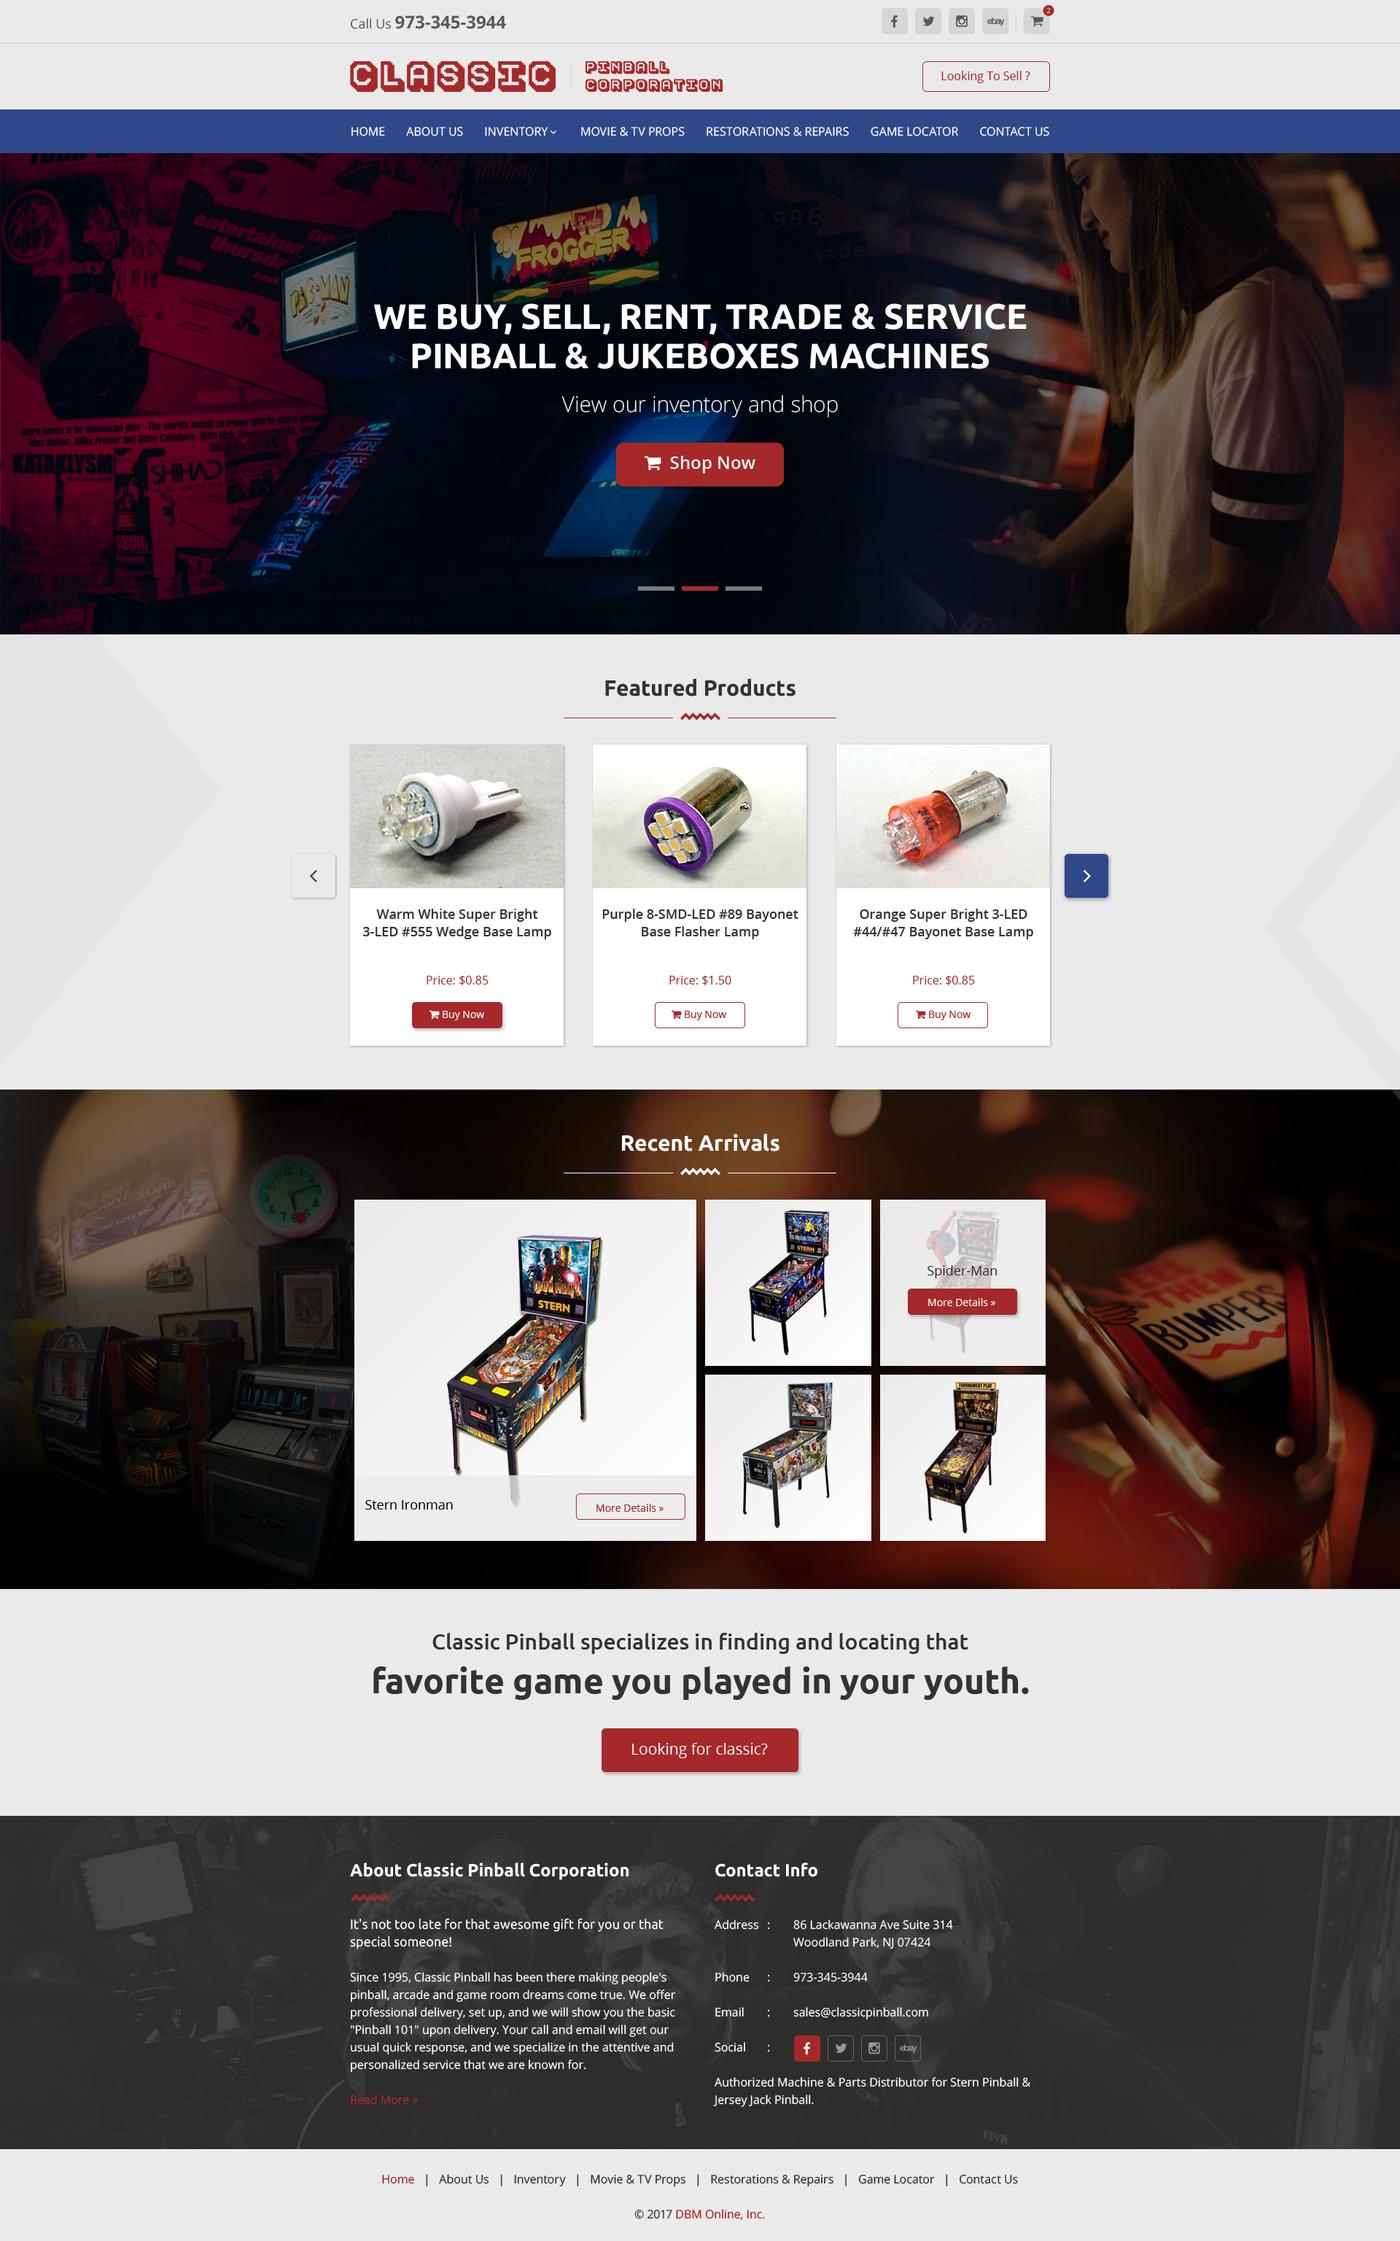 Classic Pinball Machine by abid ali at Coroflot com